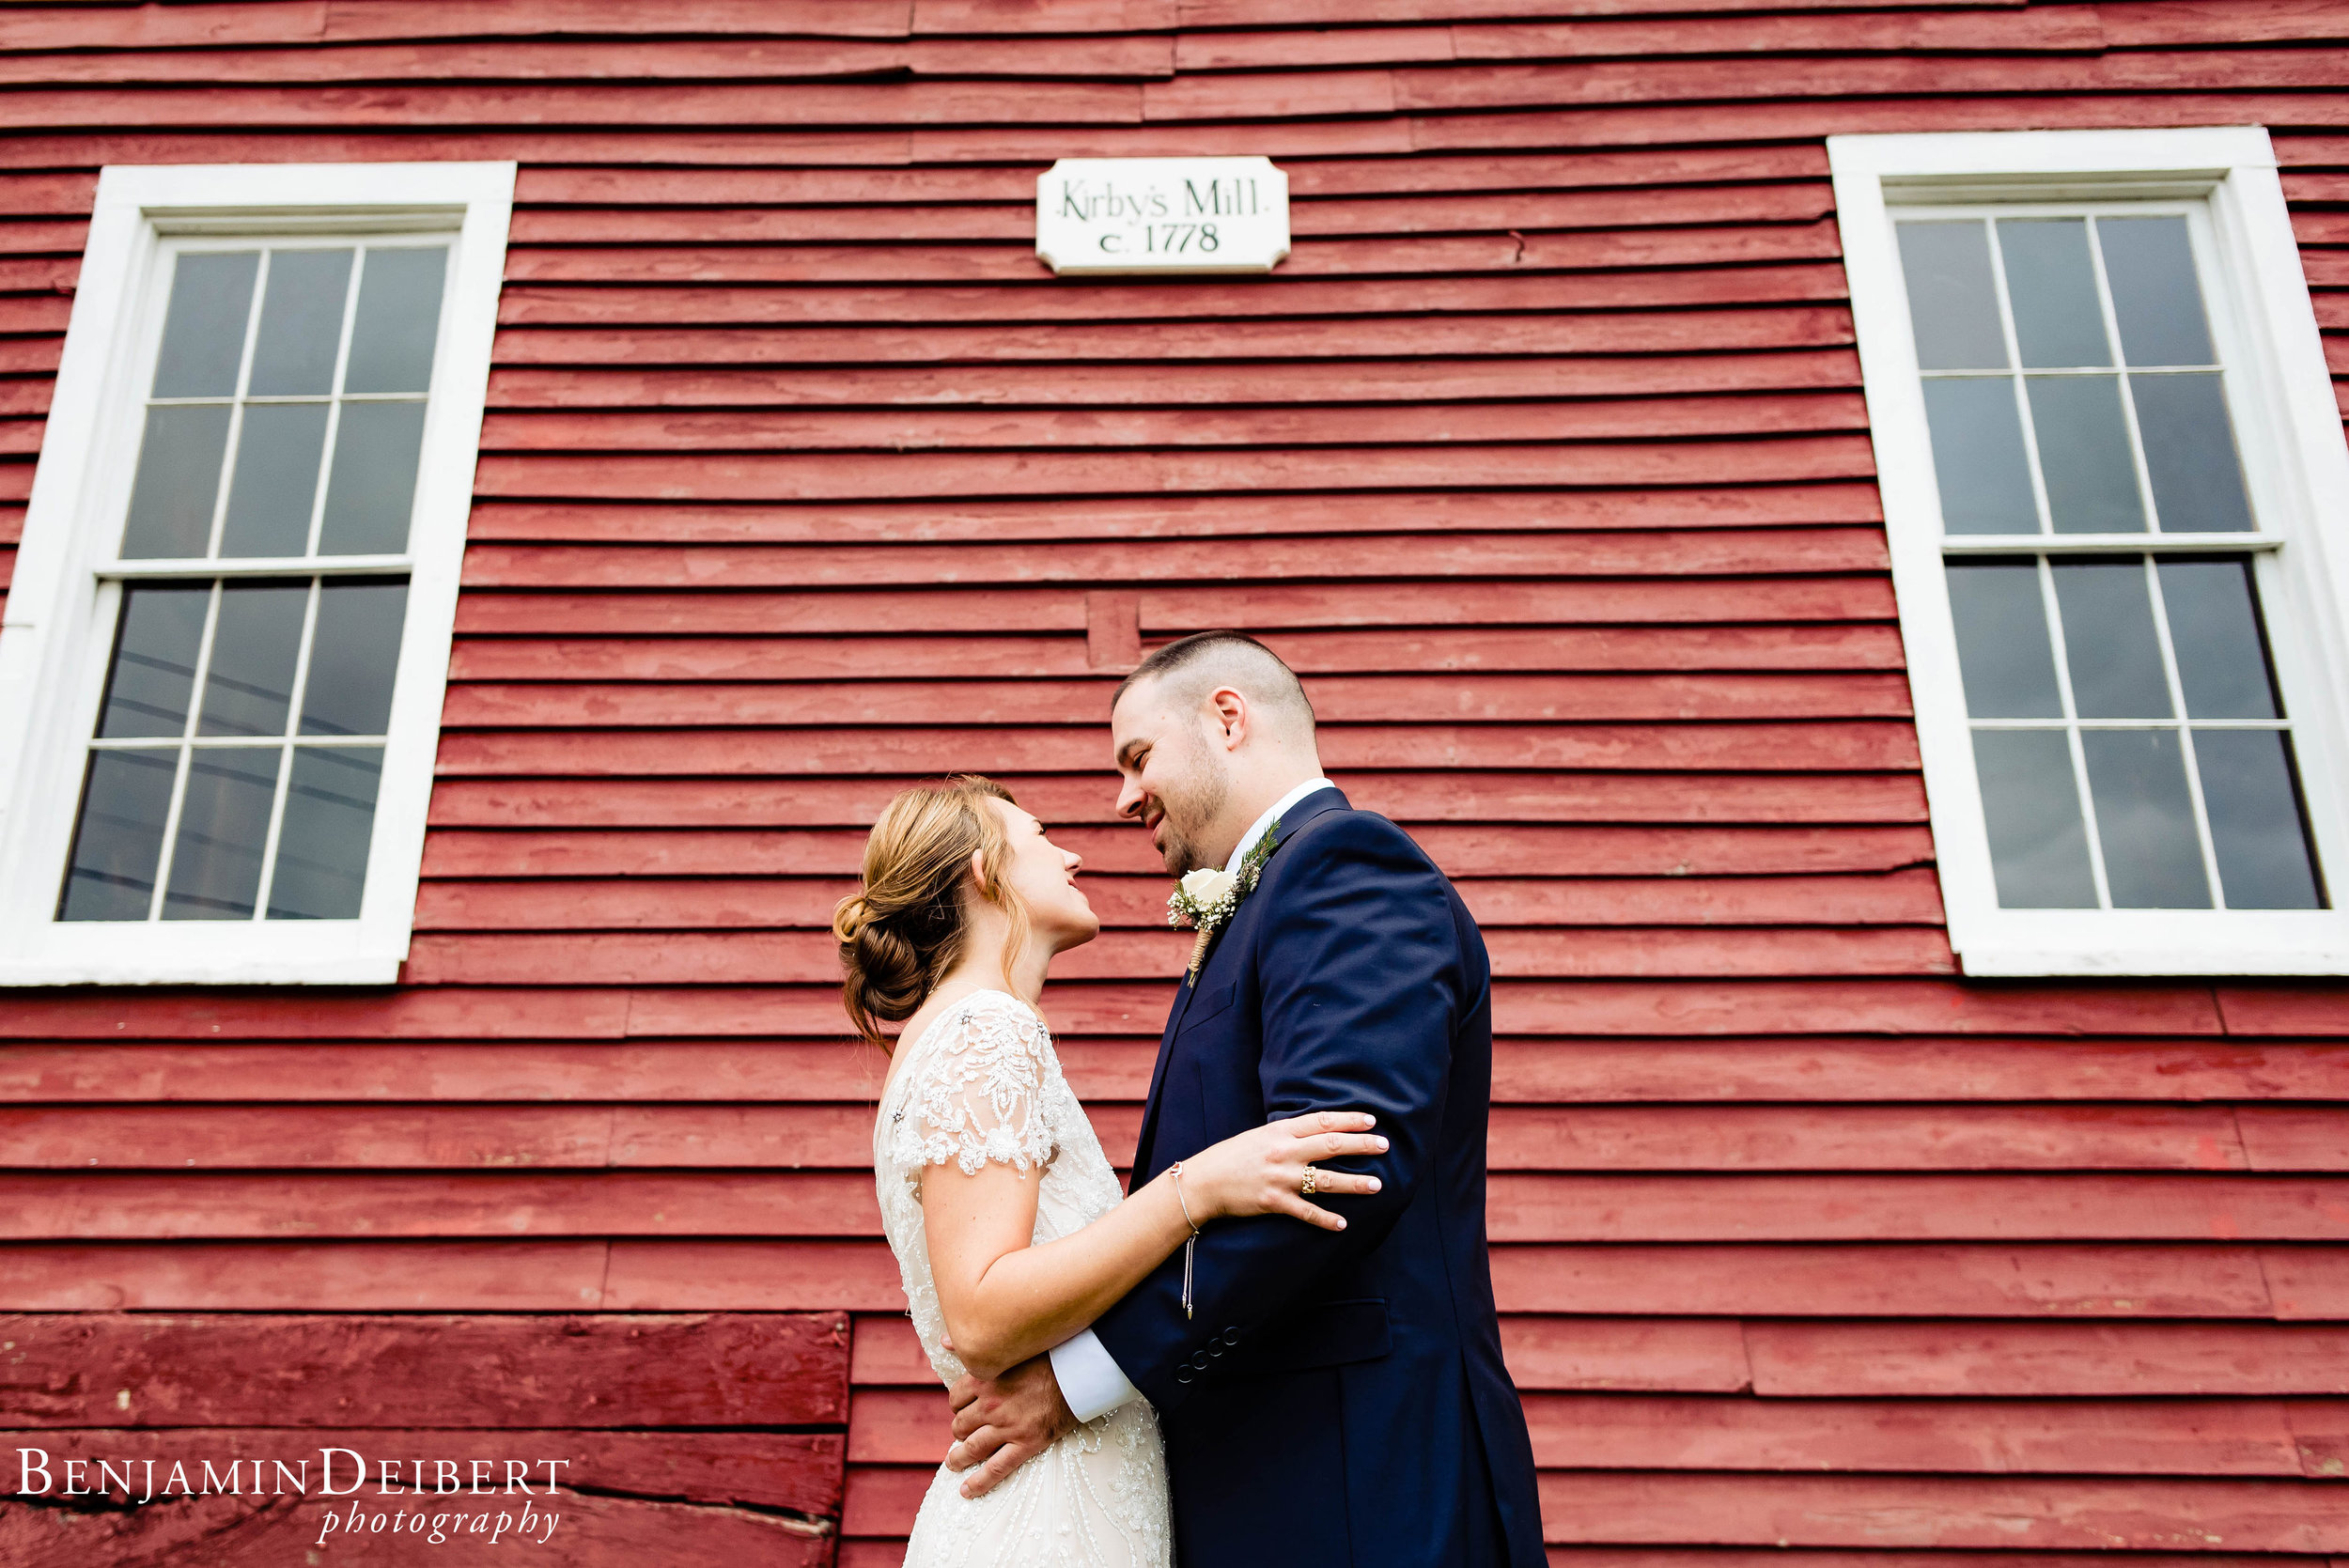 AllisonandMatt_BradfordEstate_Wedding-26.jpg